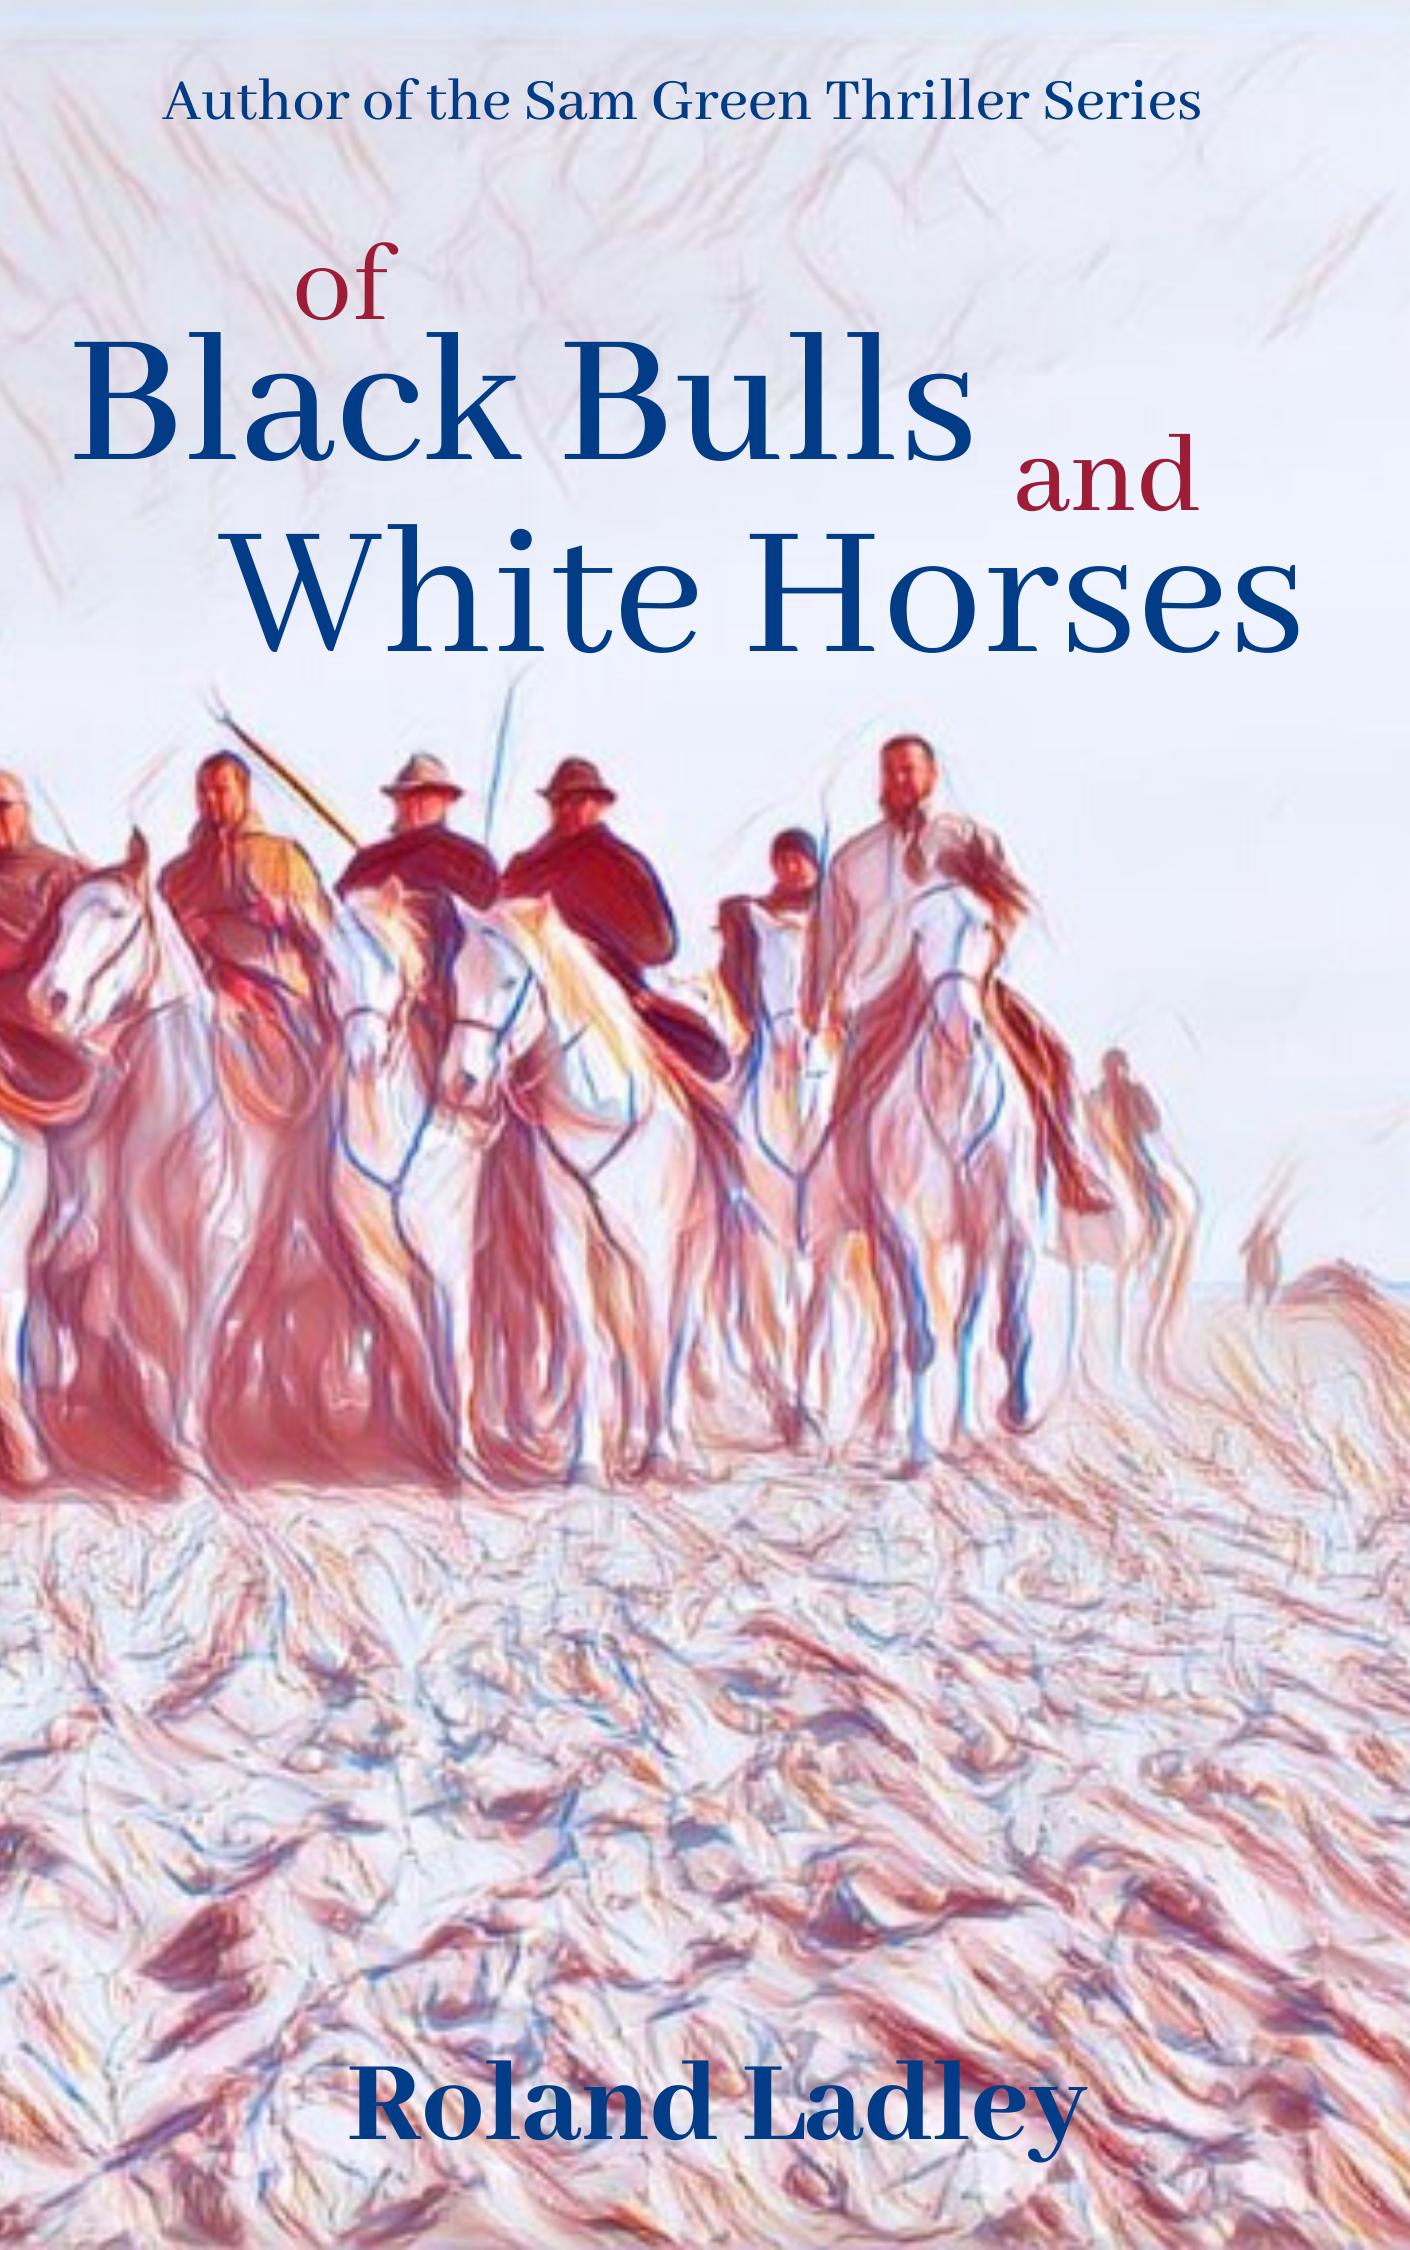 of Black Bulls and White Horses (5) (1)